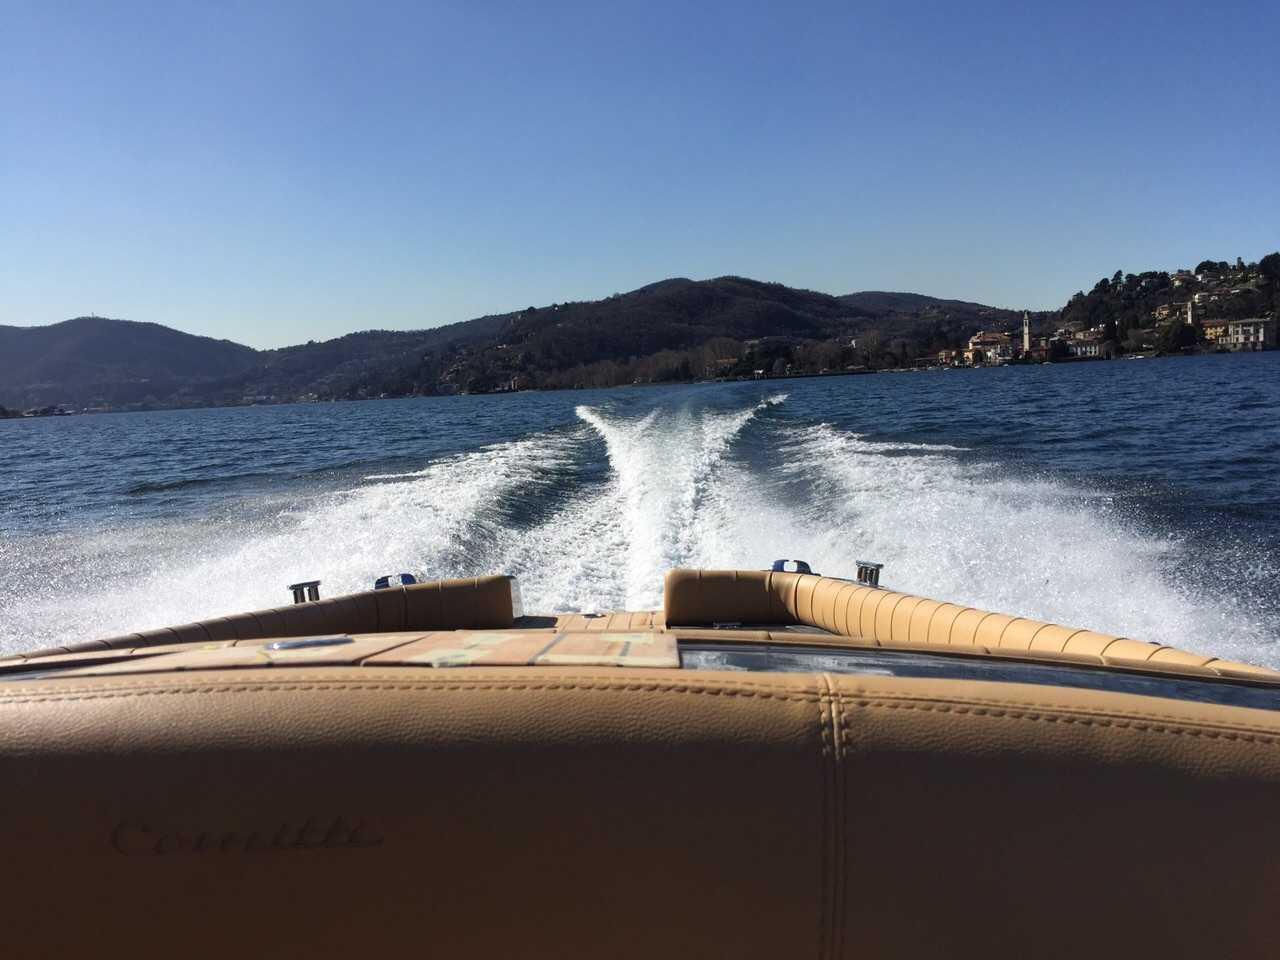 Venezia 25 Comitti North America Turner Marine Group